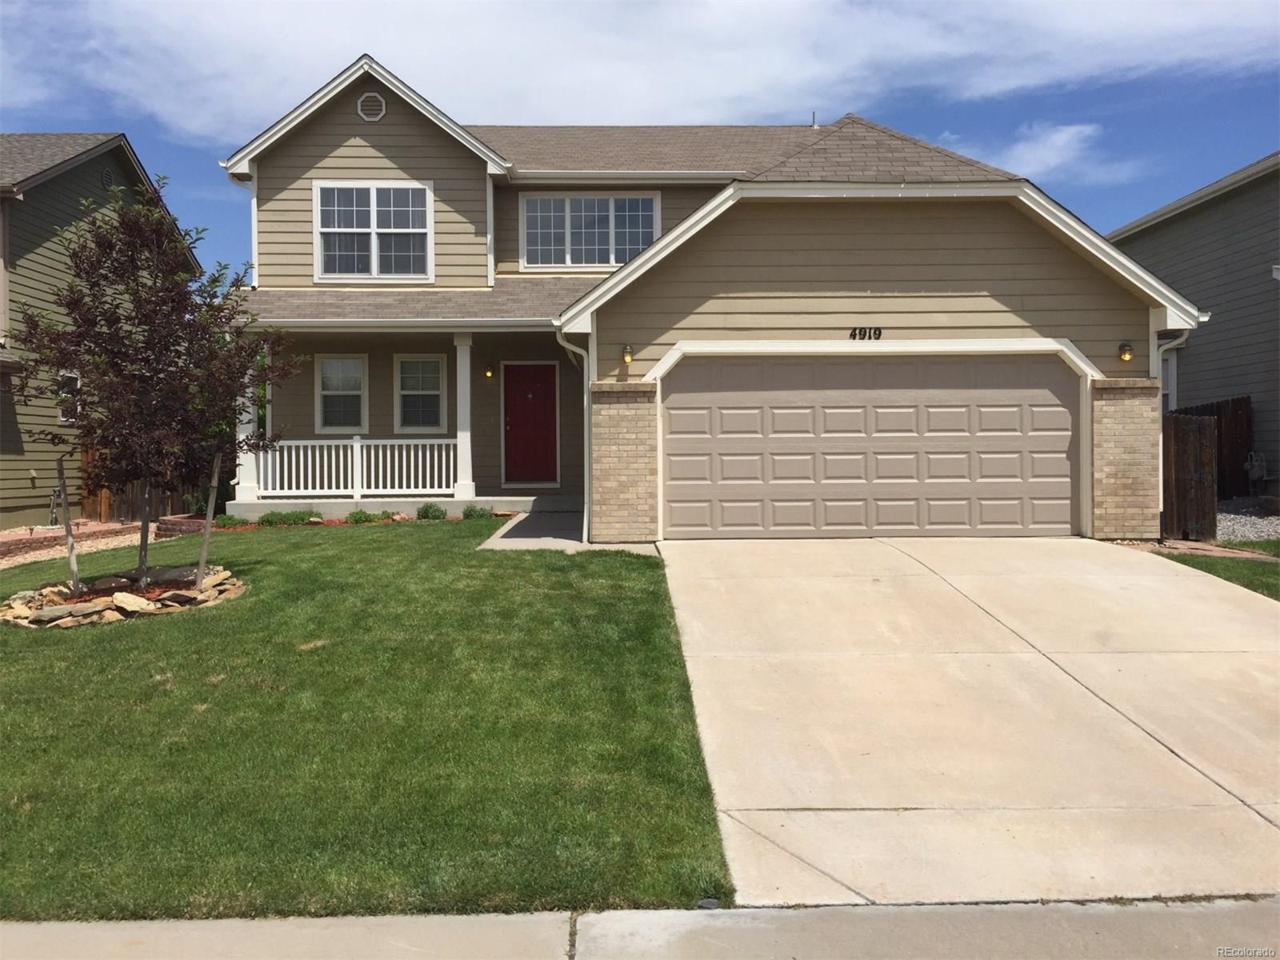 4919 E 119th Court, Thornton, CO 80233 (MLS #7003153) :: 8z Real Estate